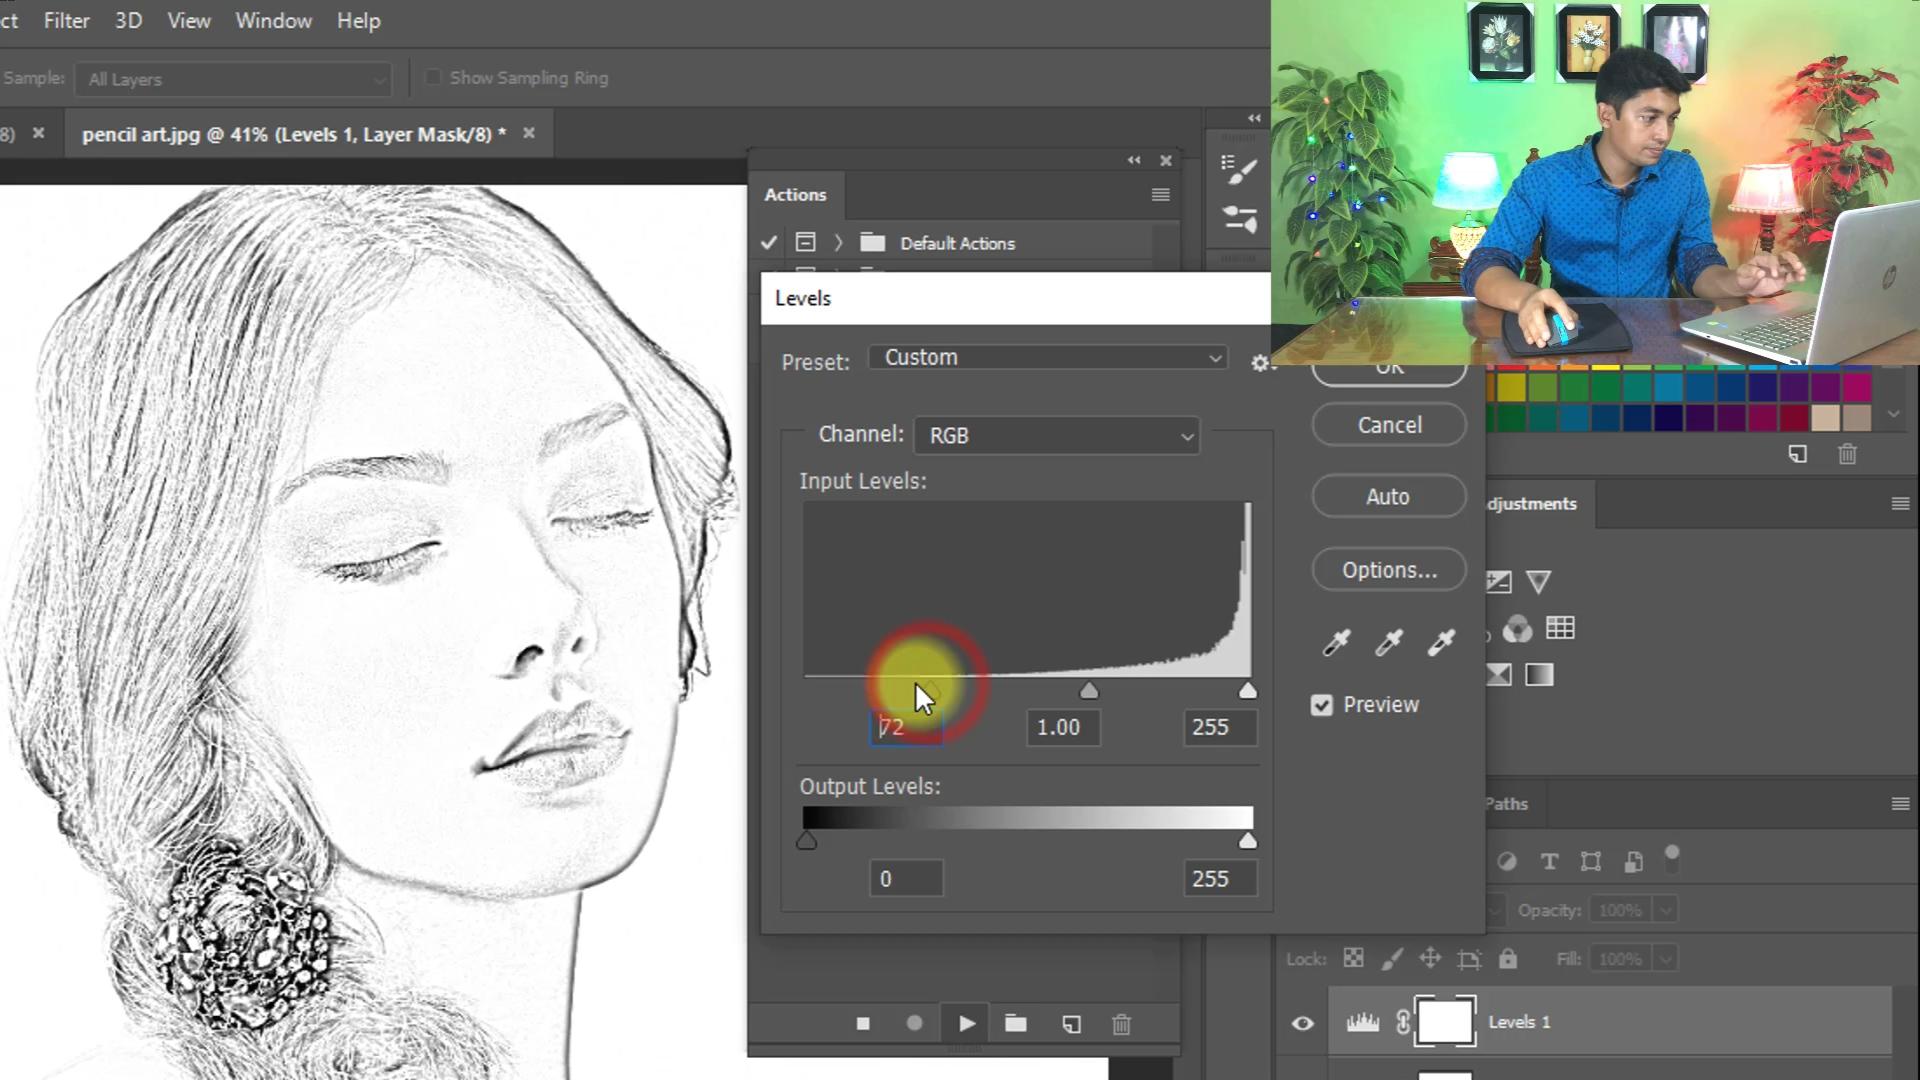 Free Download   20 Click Magic Pencil Sketch Art Photoshop Actions